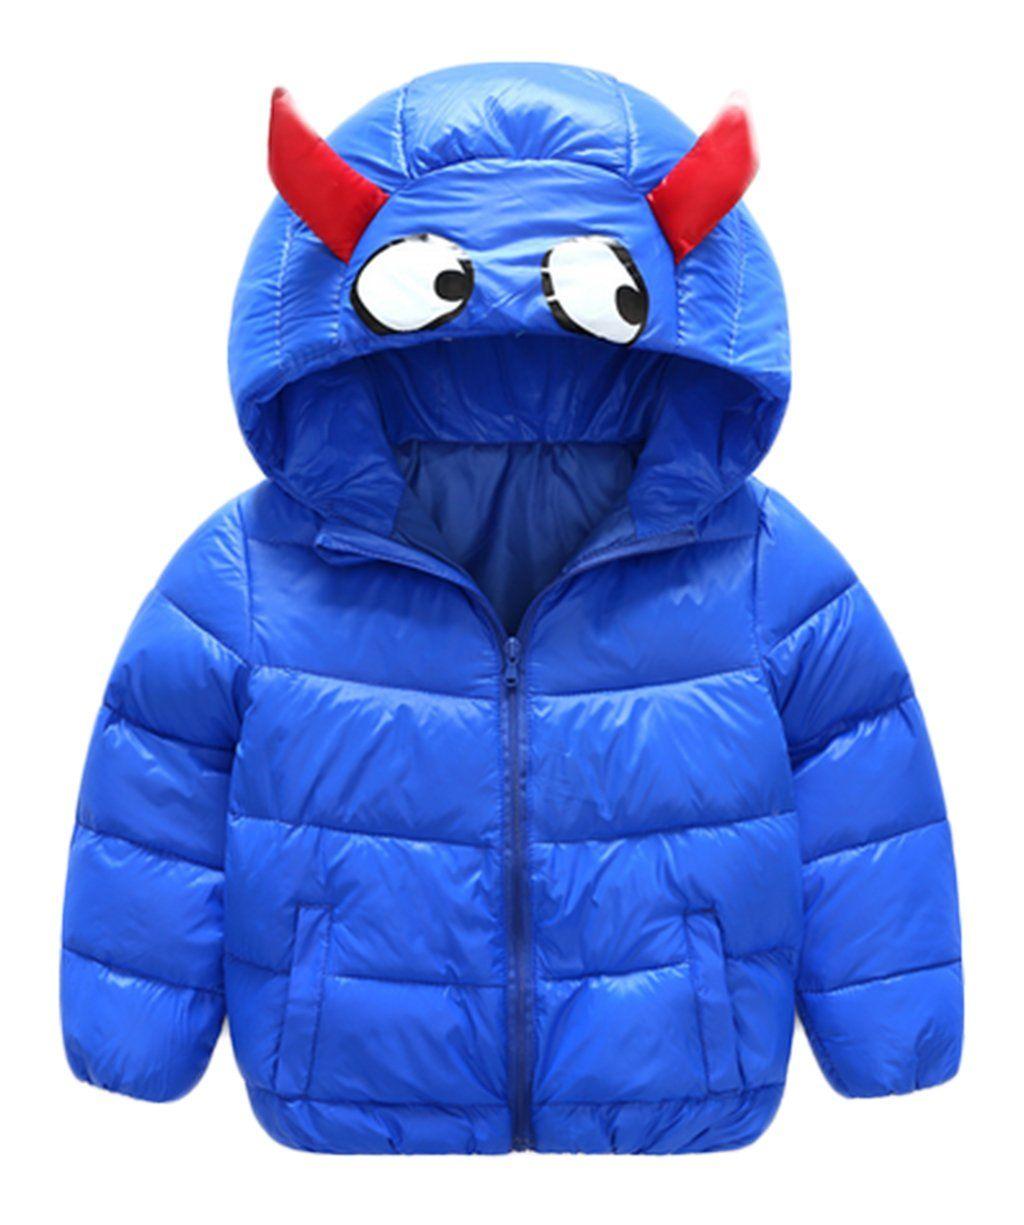 0f75f6856276 Kids Baby Boys Girls Winter Puffer Cartoon Hooded Coat Thicken Down ...